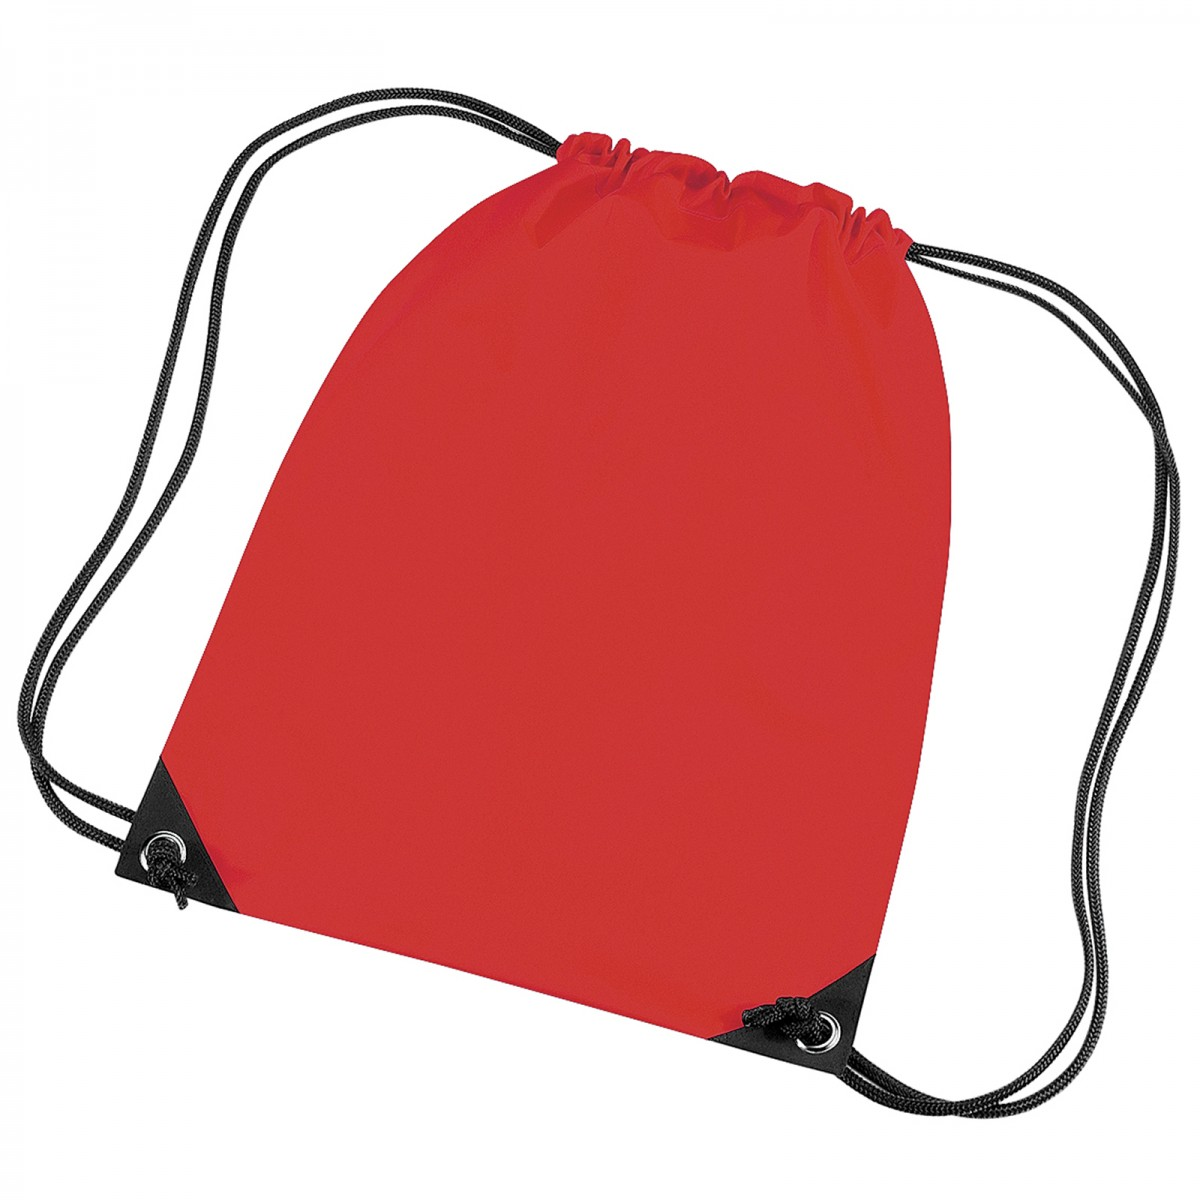 Pe Bag Clipart.